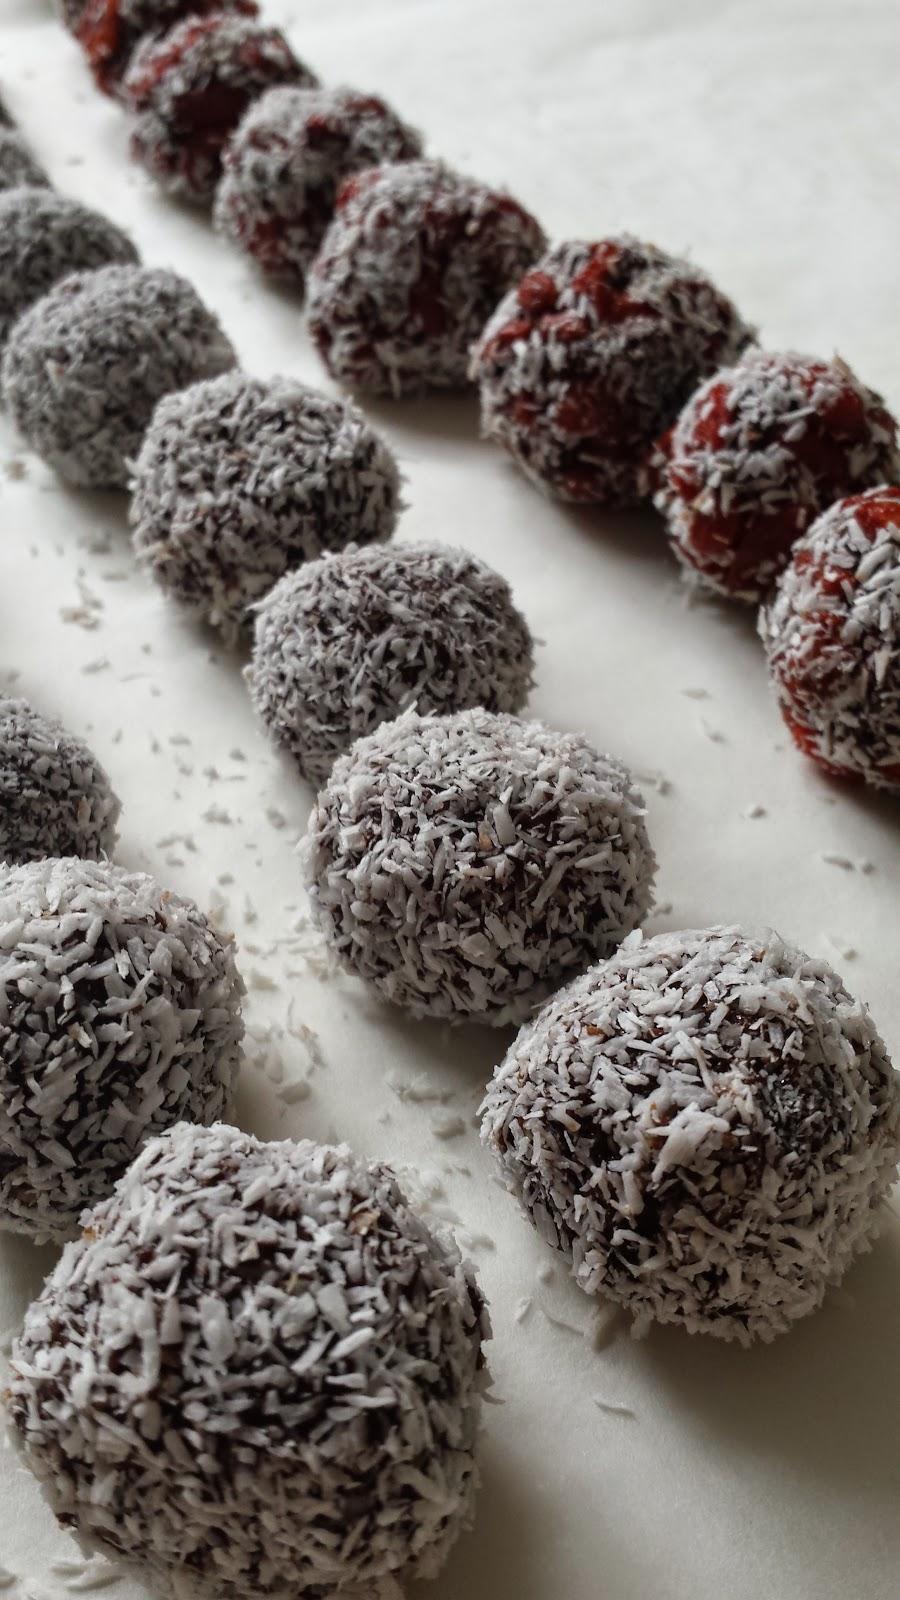 Healthilicious Life - Chocolate Coconut Amazeballs